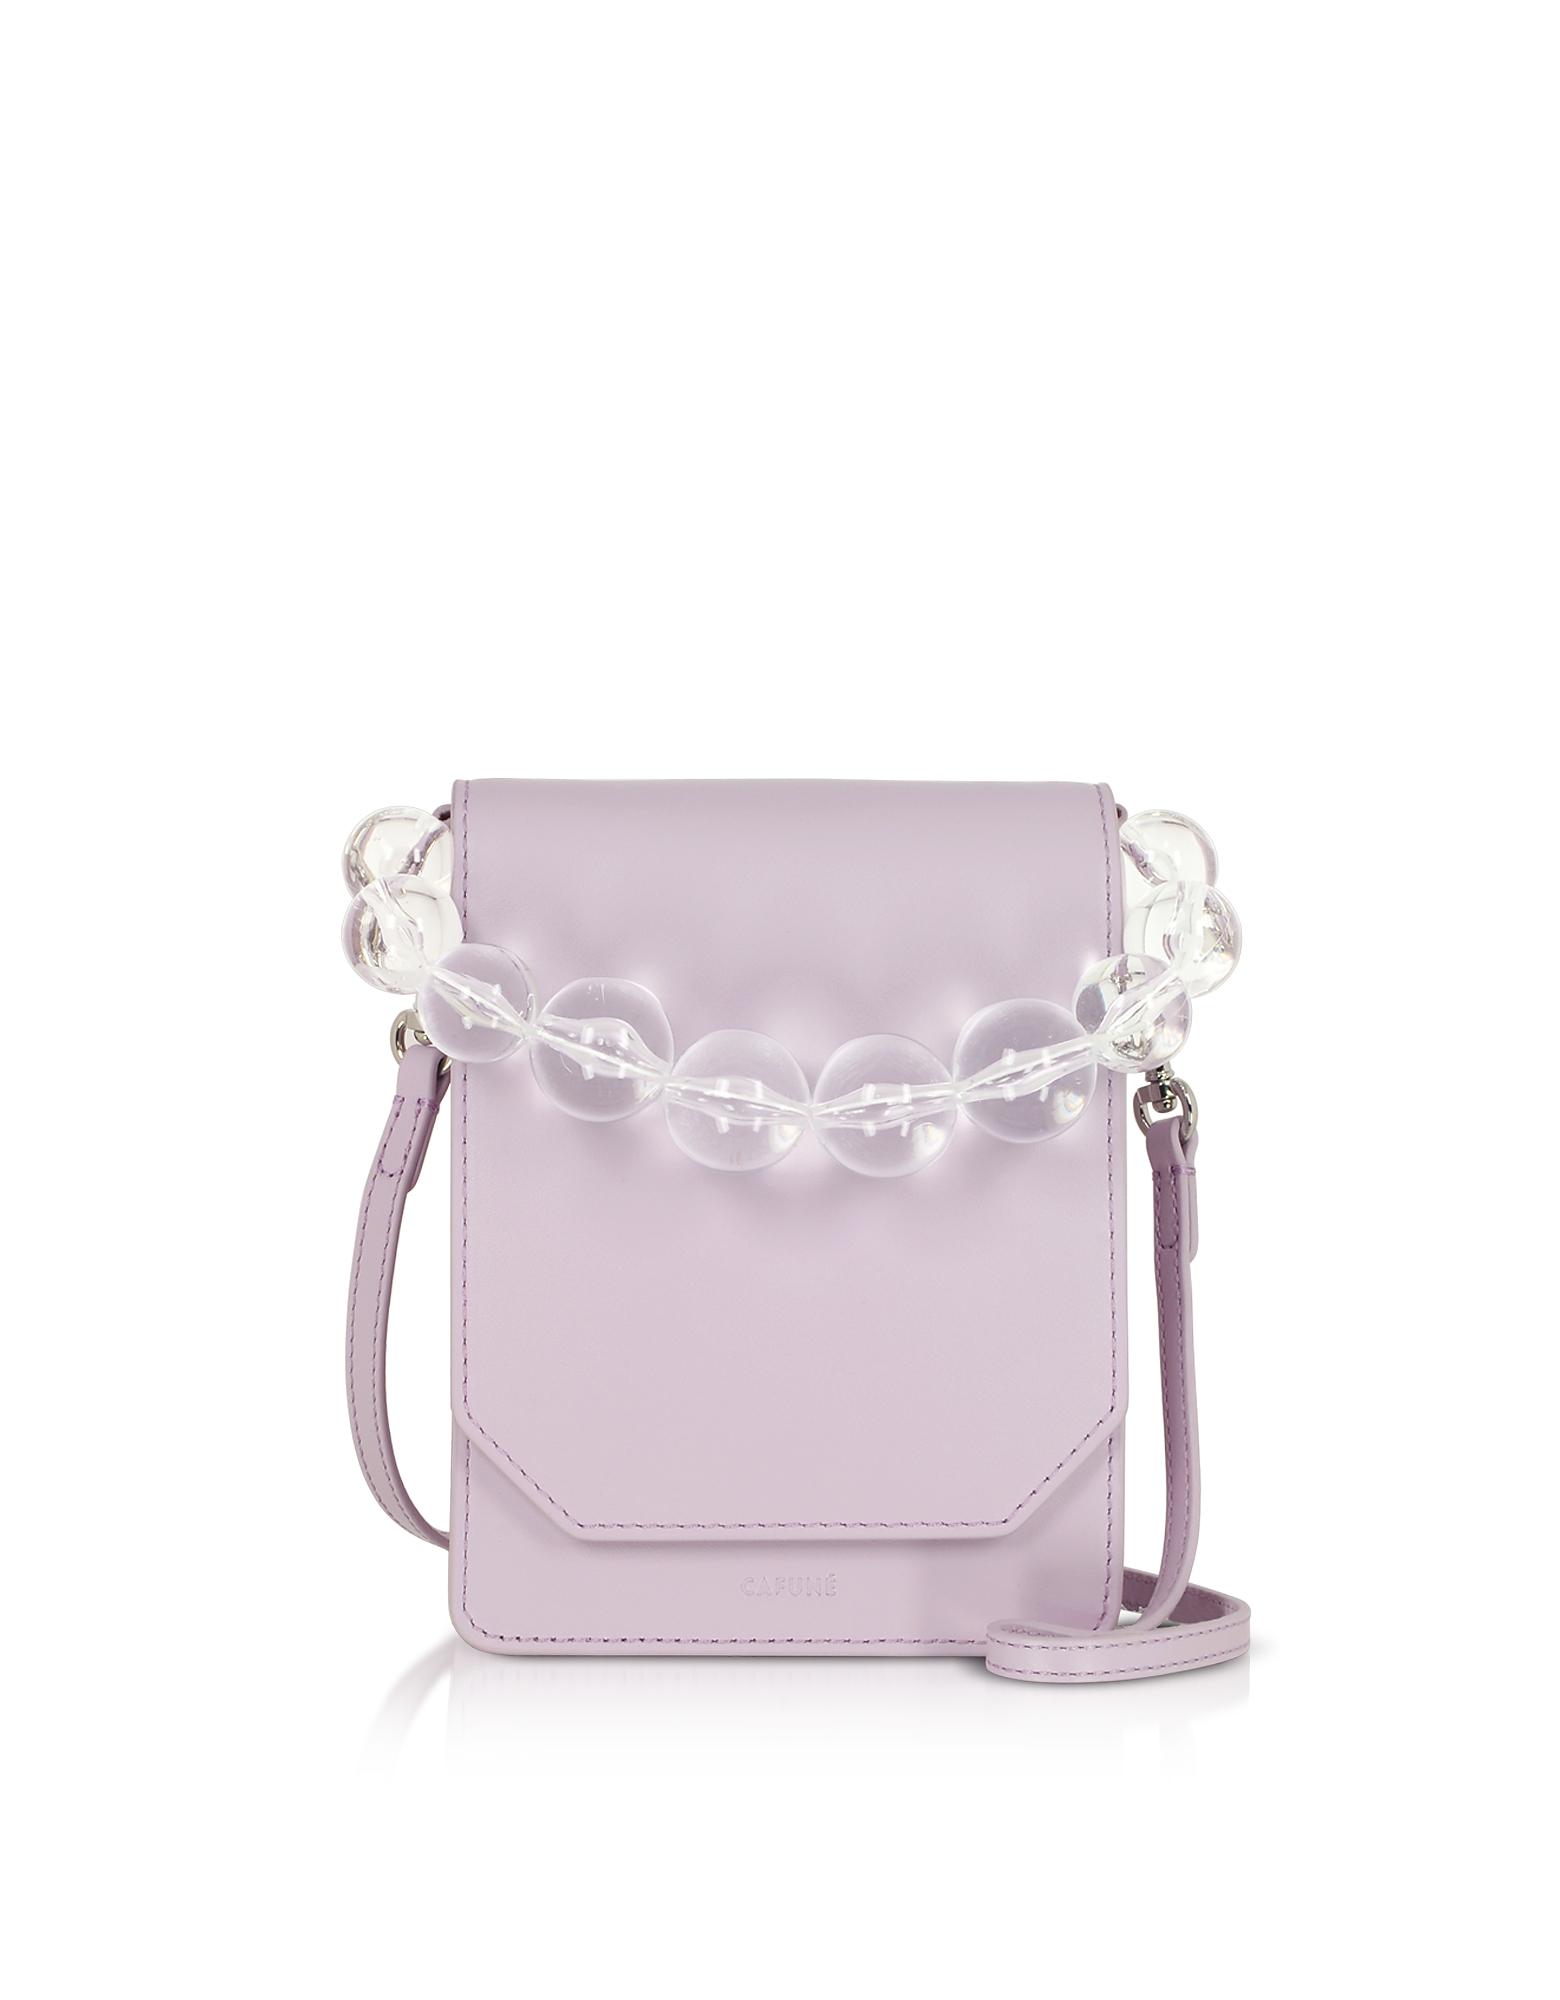 Cafuné Designer Handbags, Lilac Smooth Leather Bellows Crossbody Bag